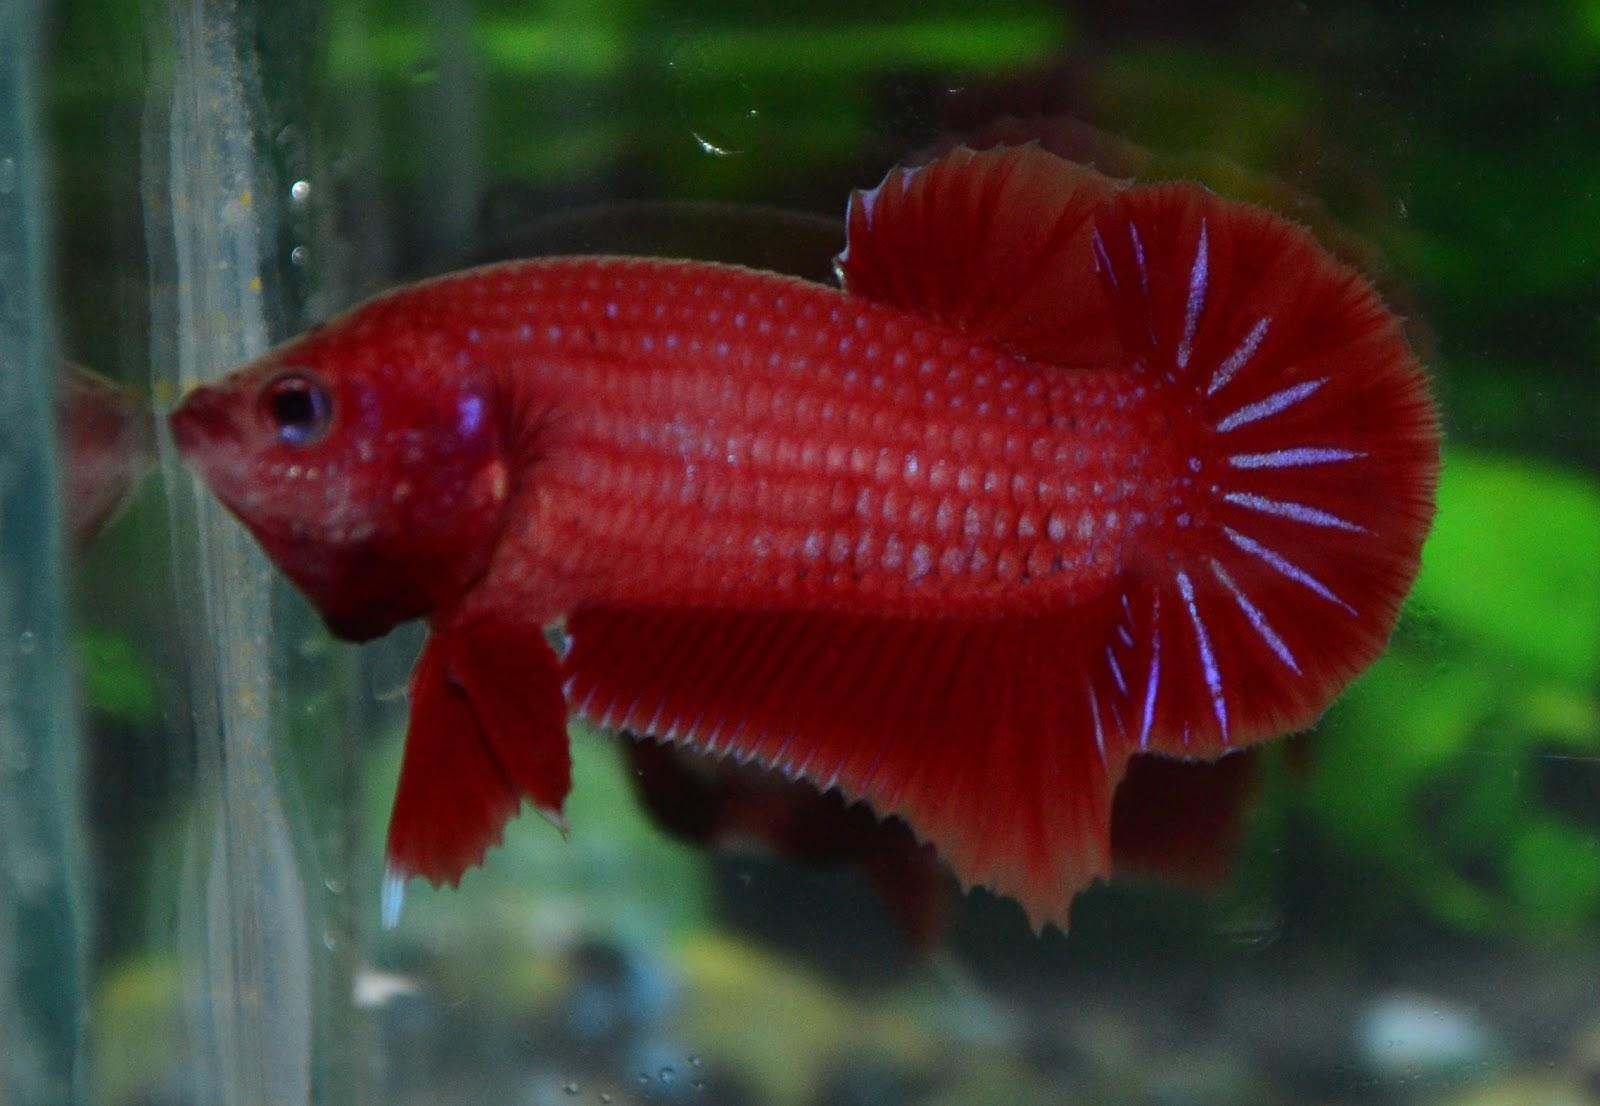 Betta fish afira betta nj cambodian red sold for Pictures of betta fish